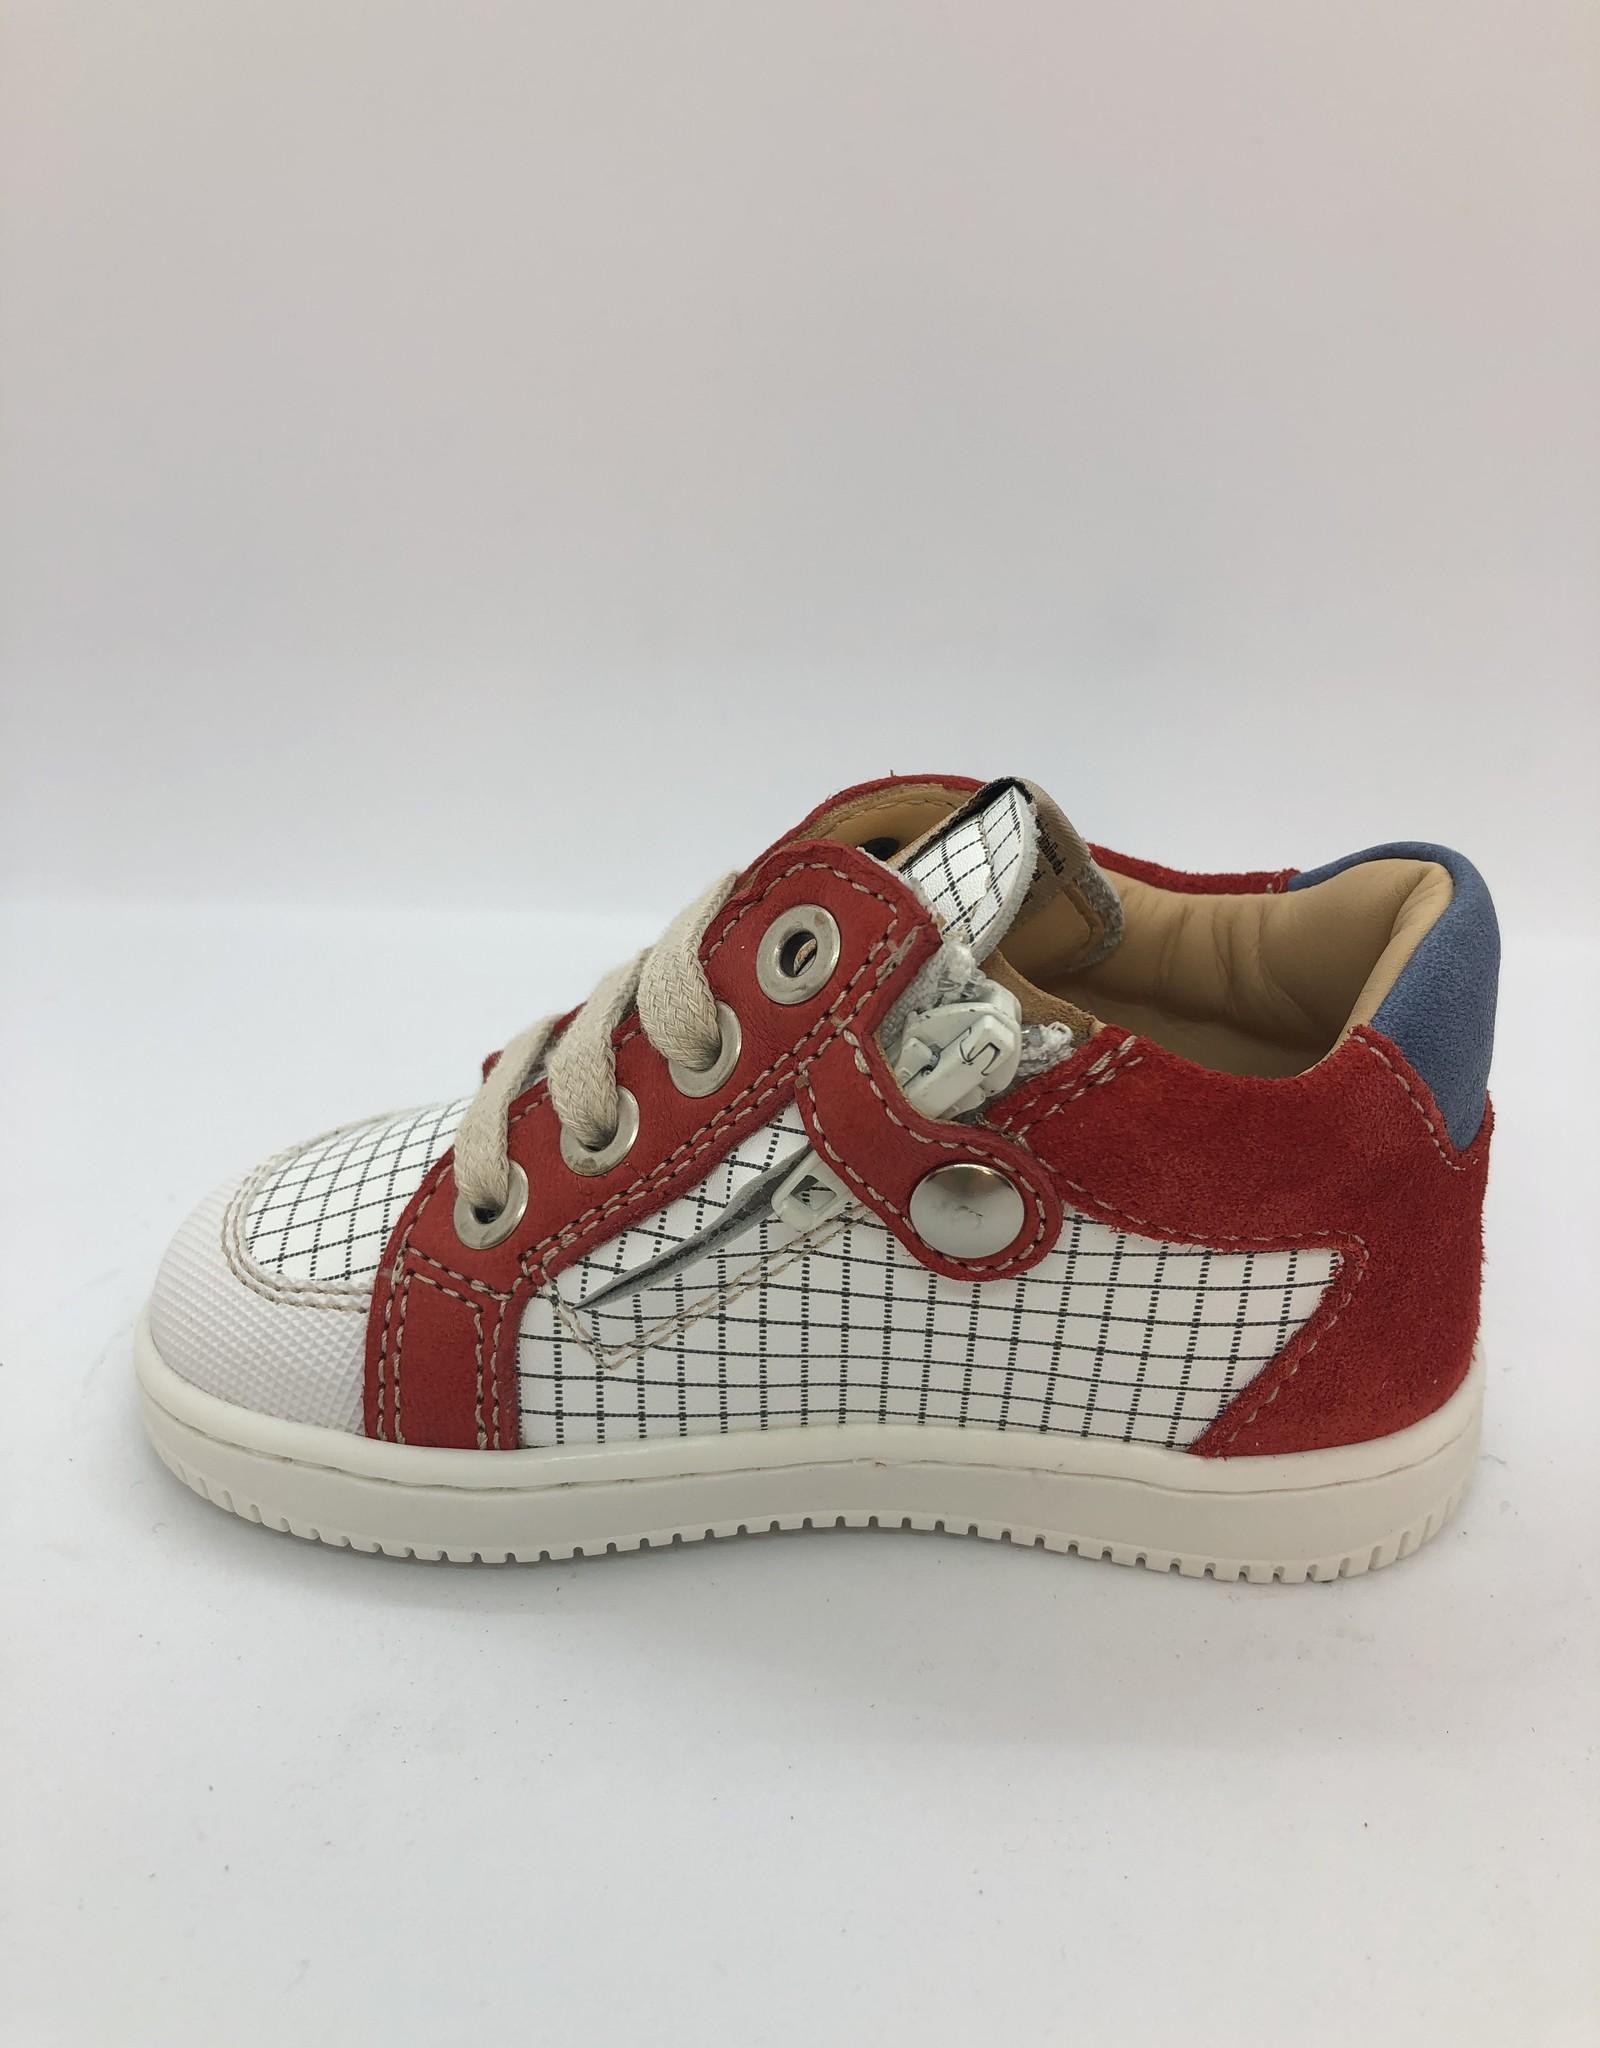 Ocra D076 sneaker wit rood veter/rits